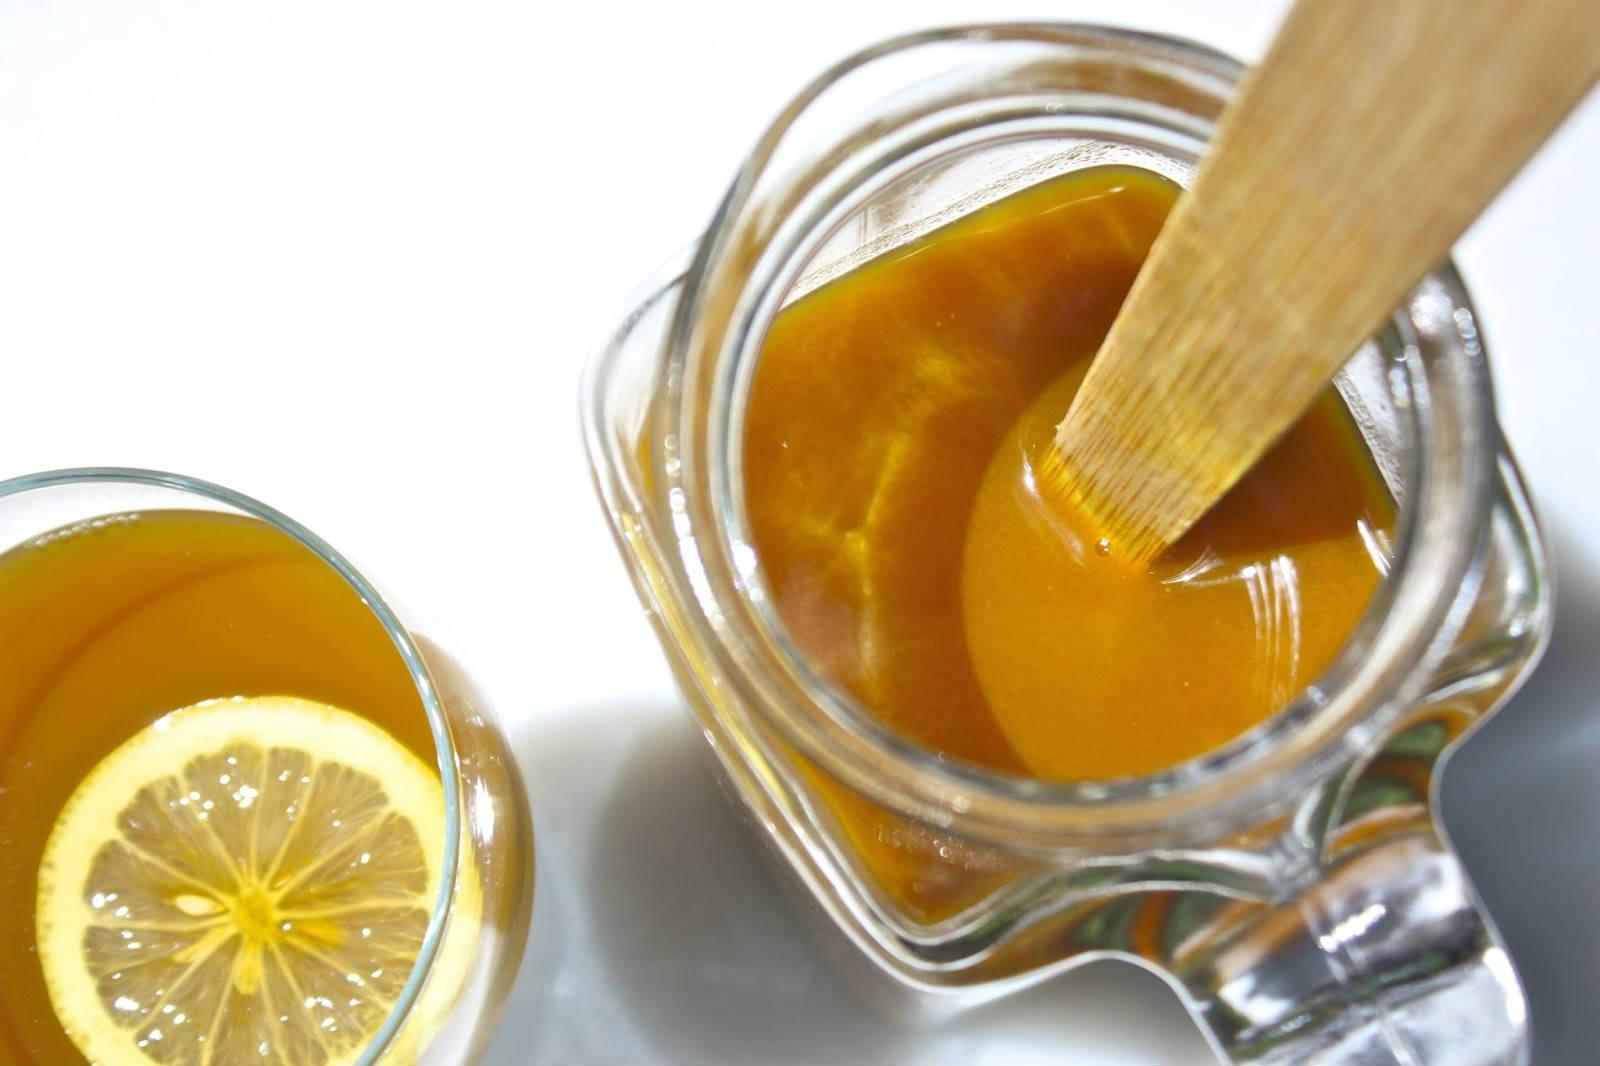 lemon zest meaning in hindi